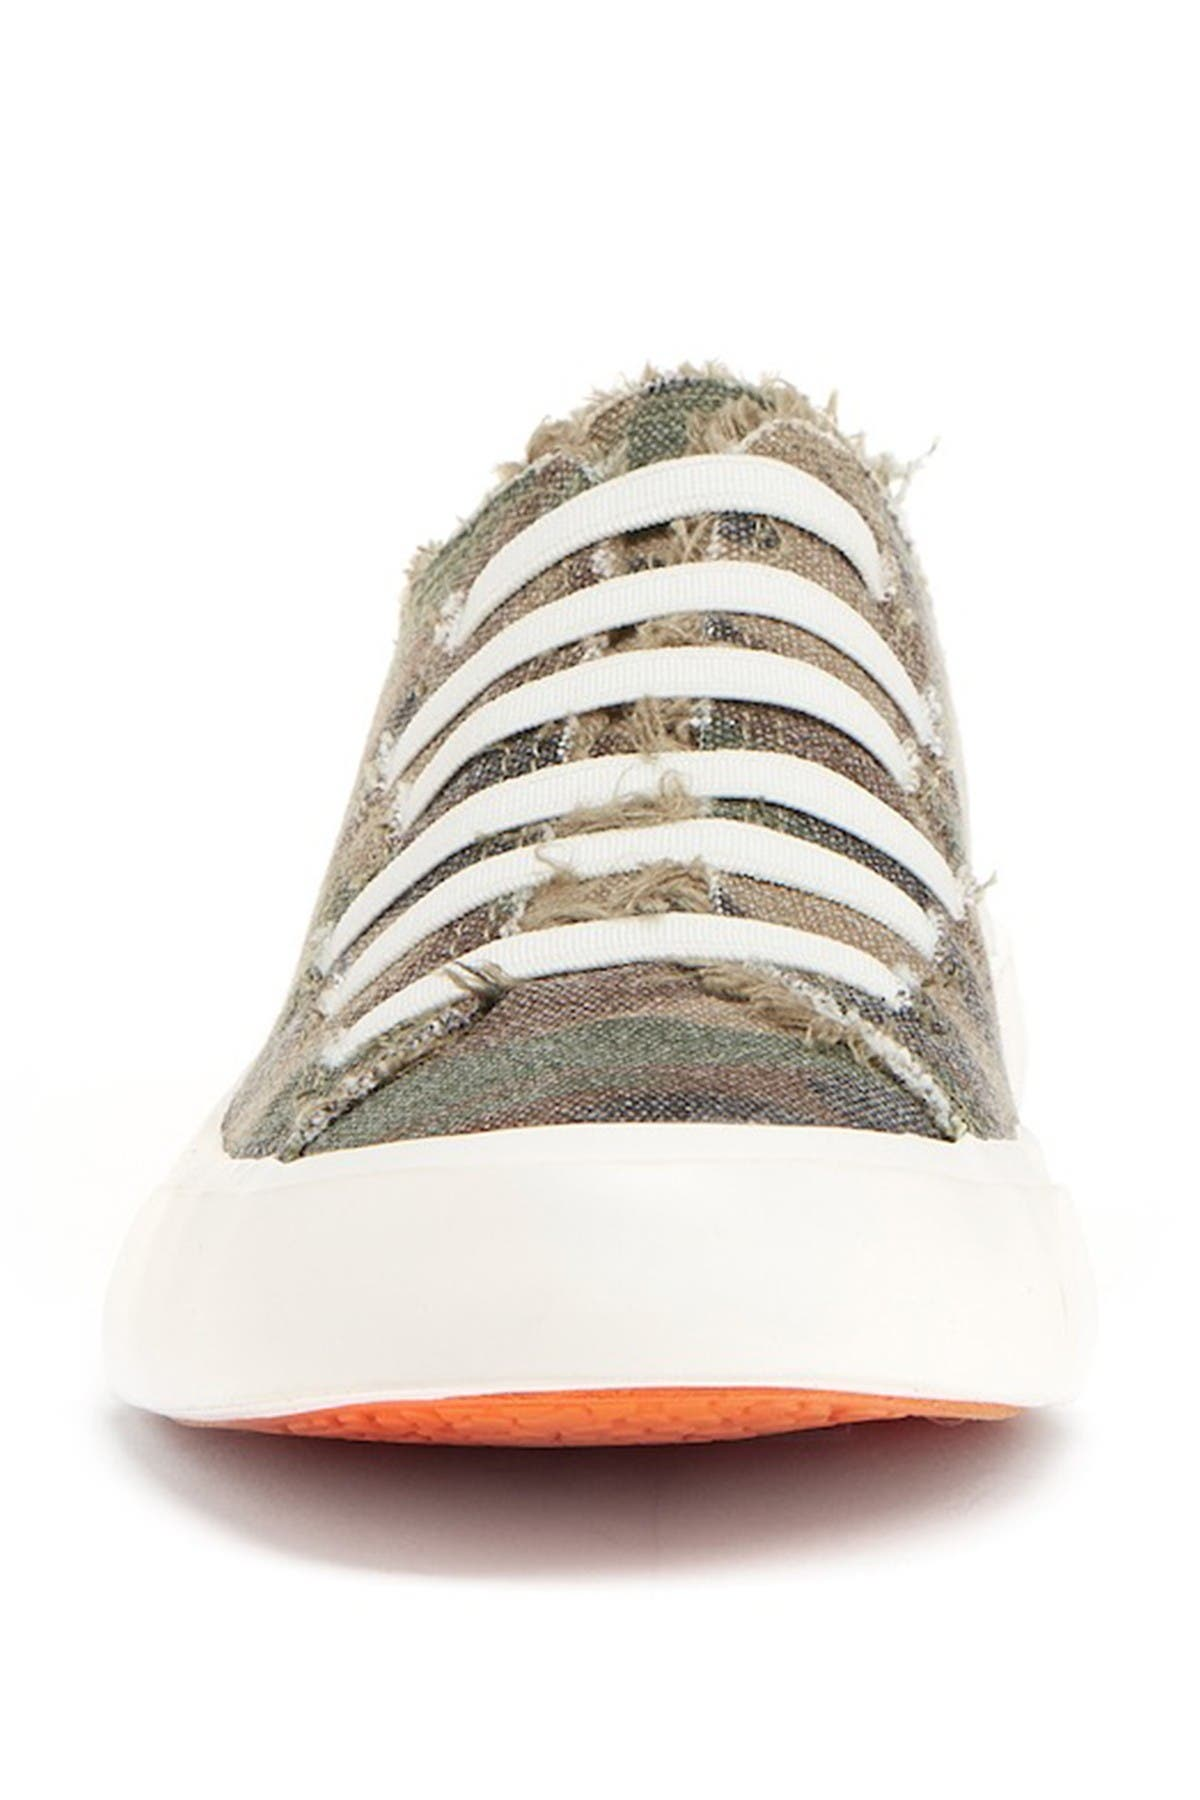 Image of Rocket Dog Jolly Slip-On Sneaker